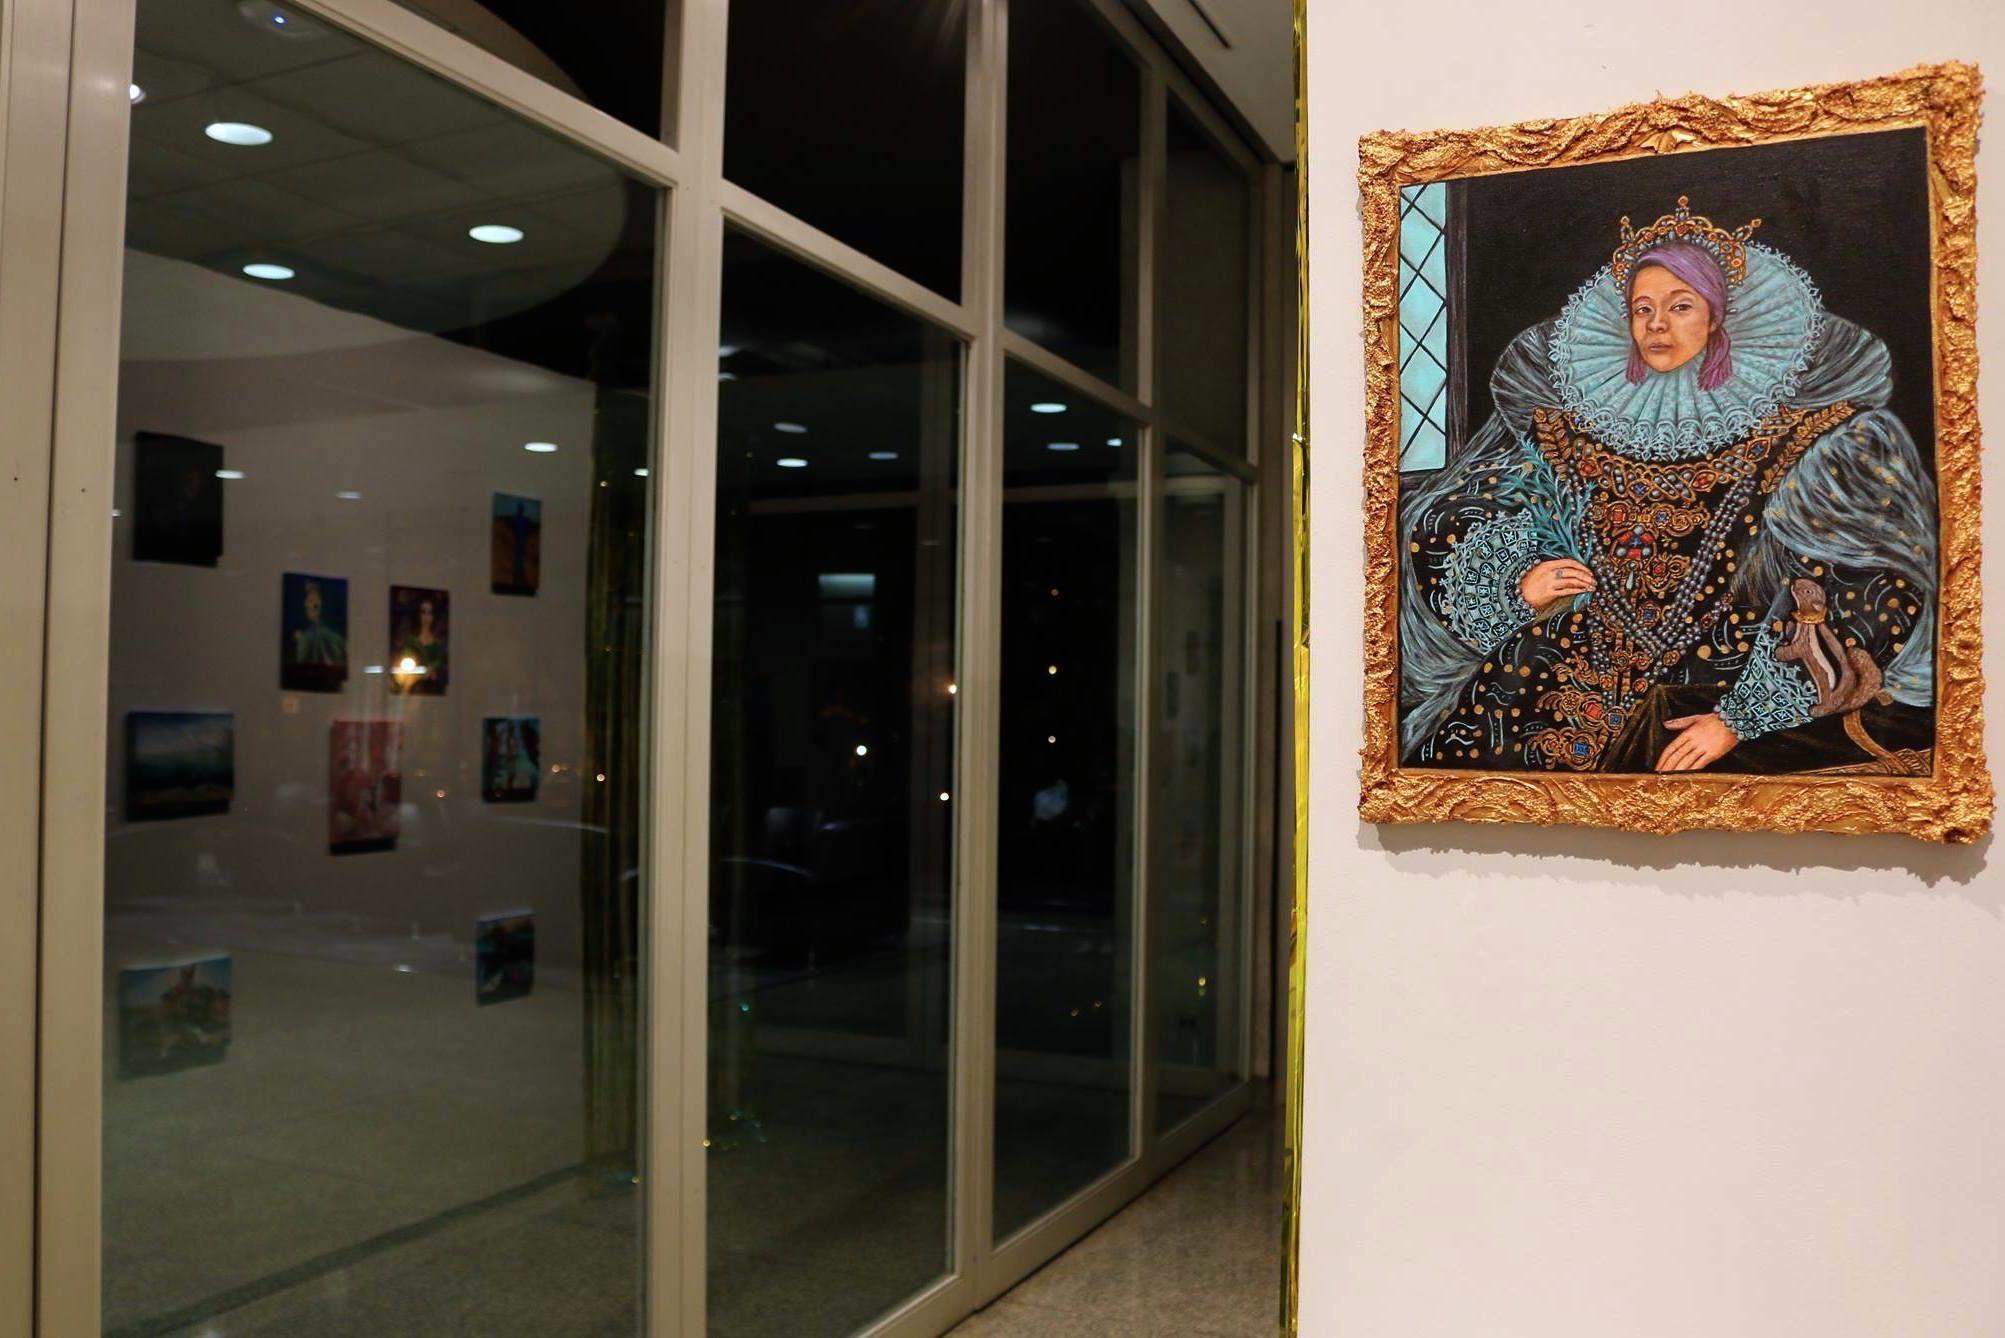 Mia Larson - Senior Exhibition